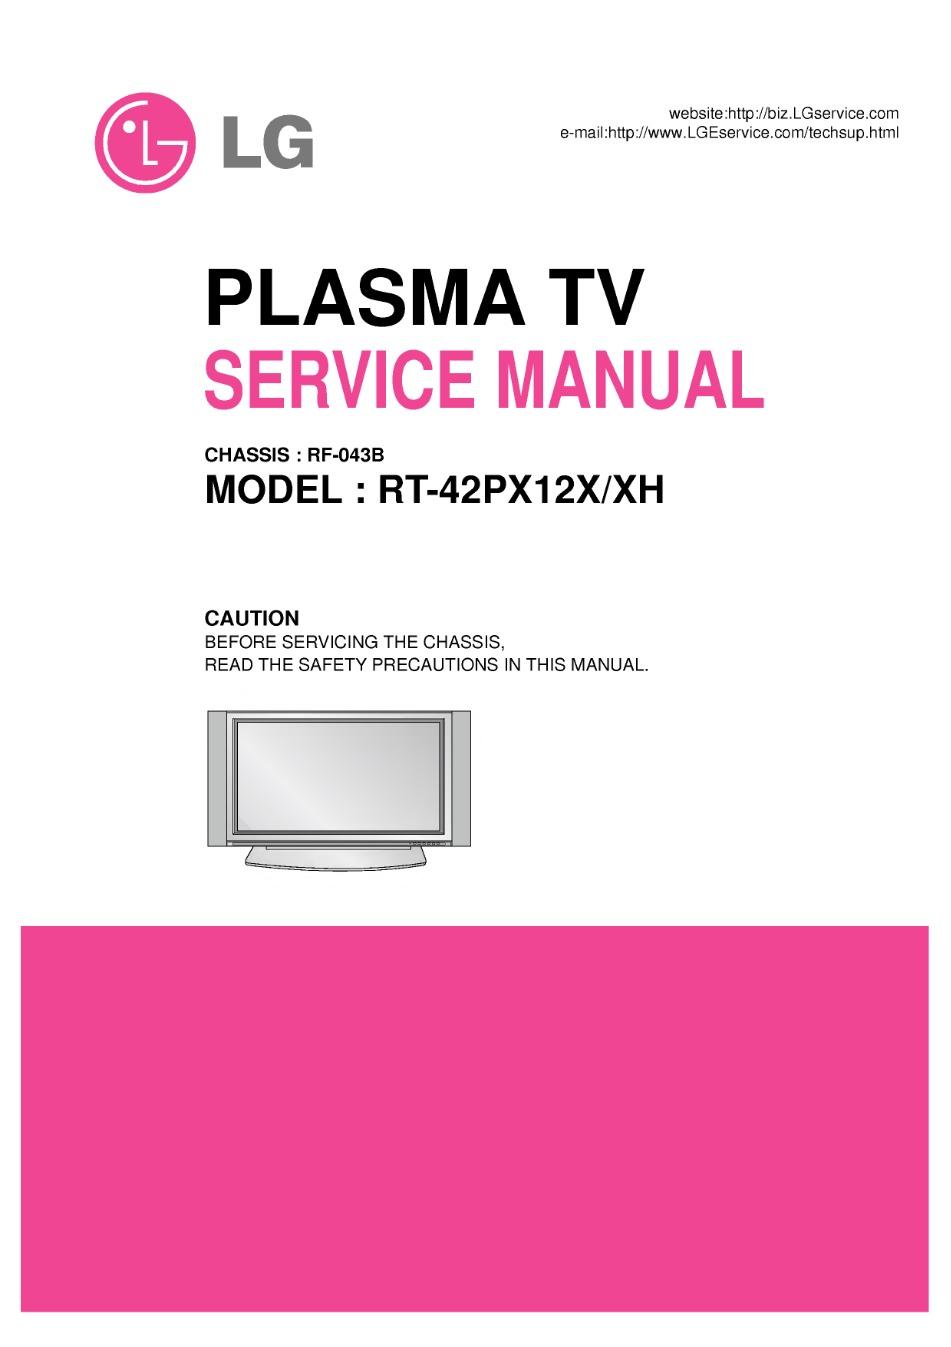 rt-42px12x, rt-42px12xh (chassis:rf-043b) service manual